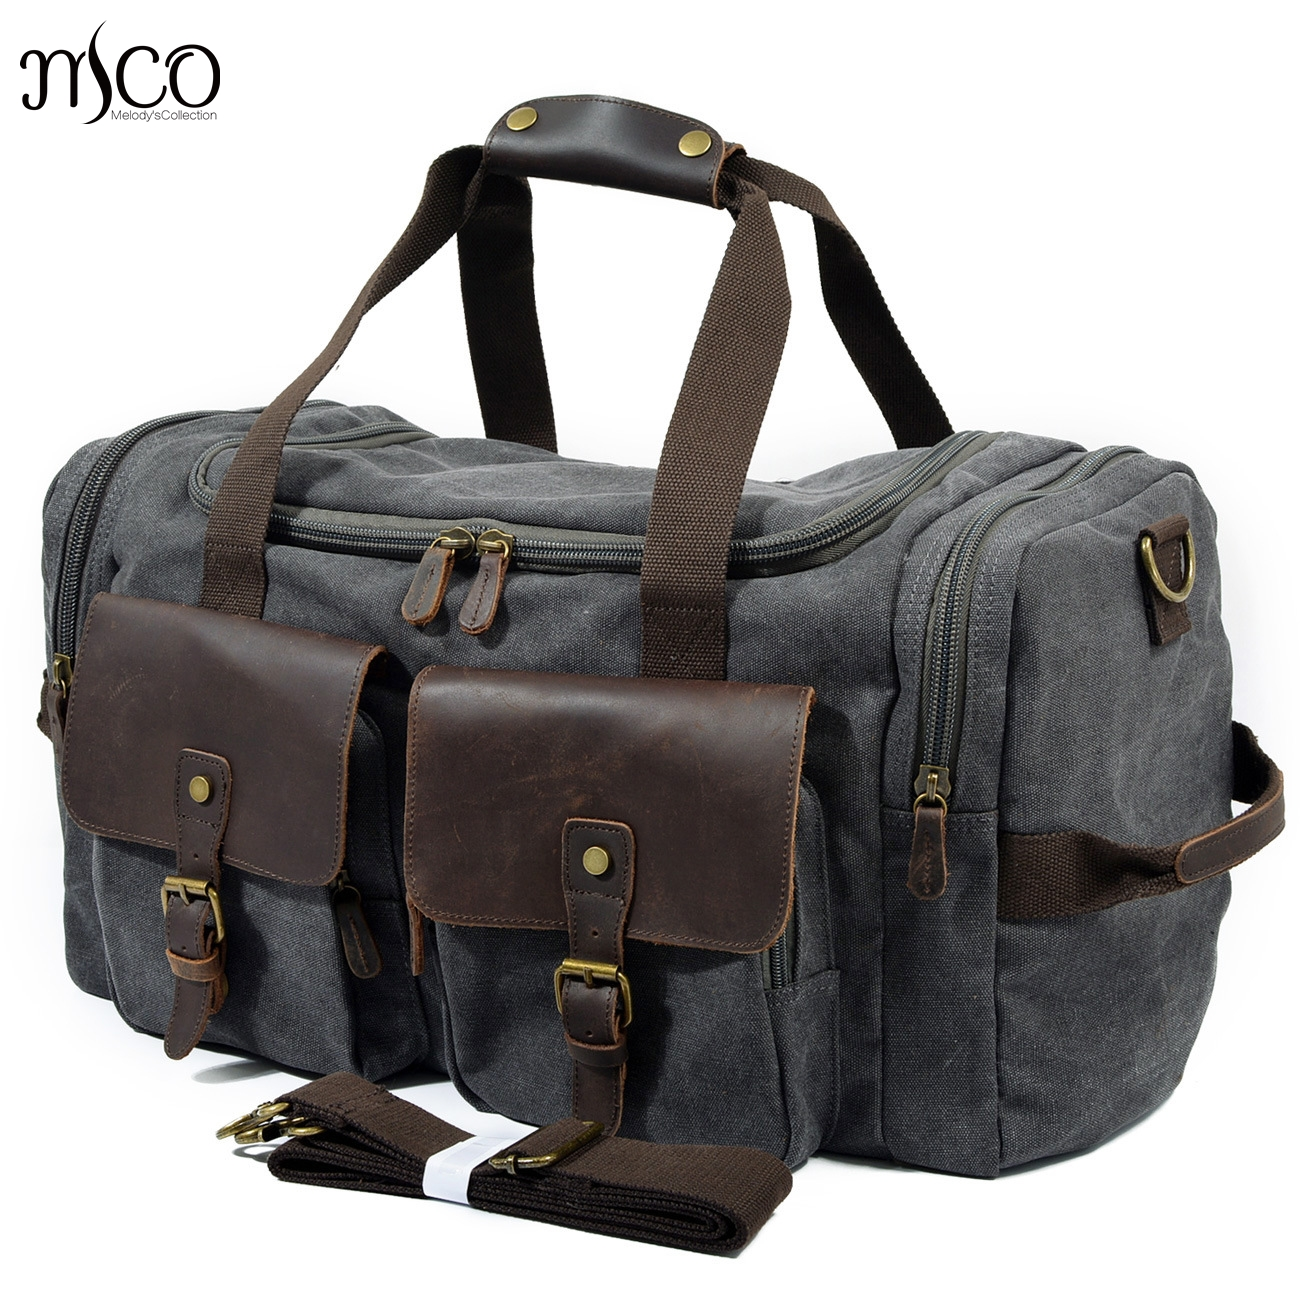 цены на Man Vintage Military Travel Duffel Bag Multi-pocket Canvas Overnight Bag Leather Weekend Carry on Big Shoulder Bags Tote Luggage в интернет-магазинах